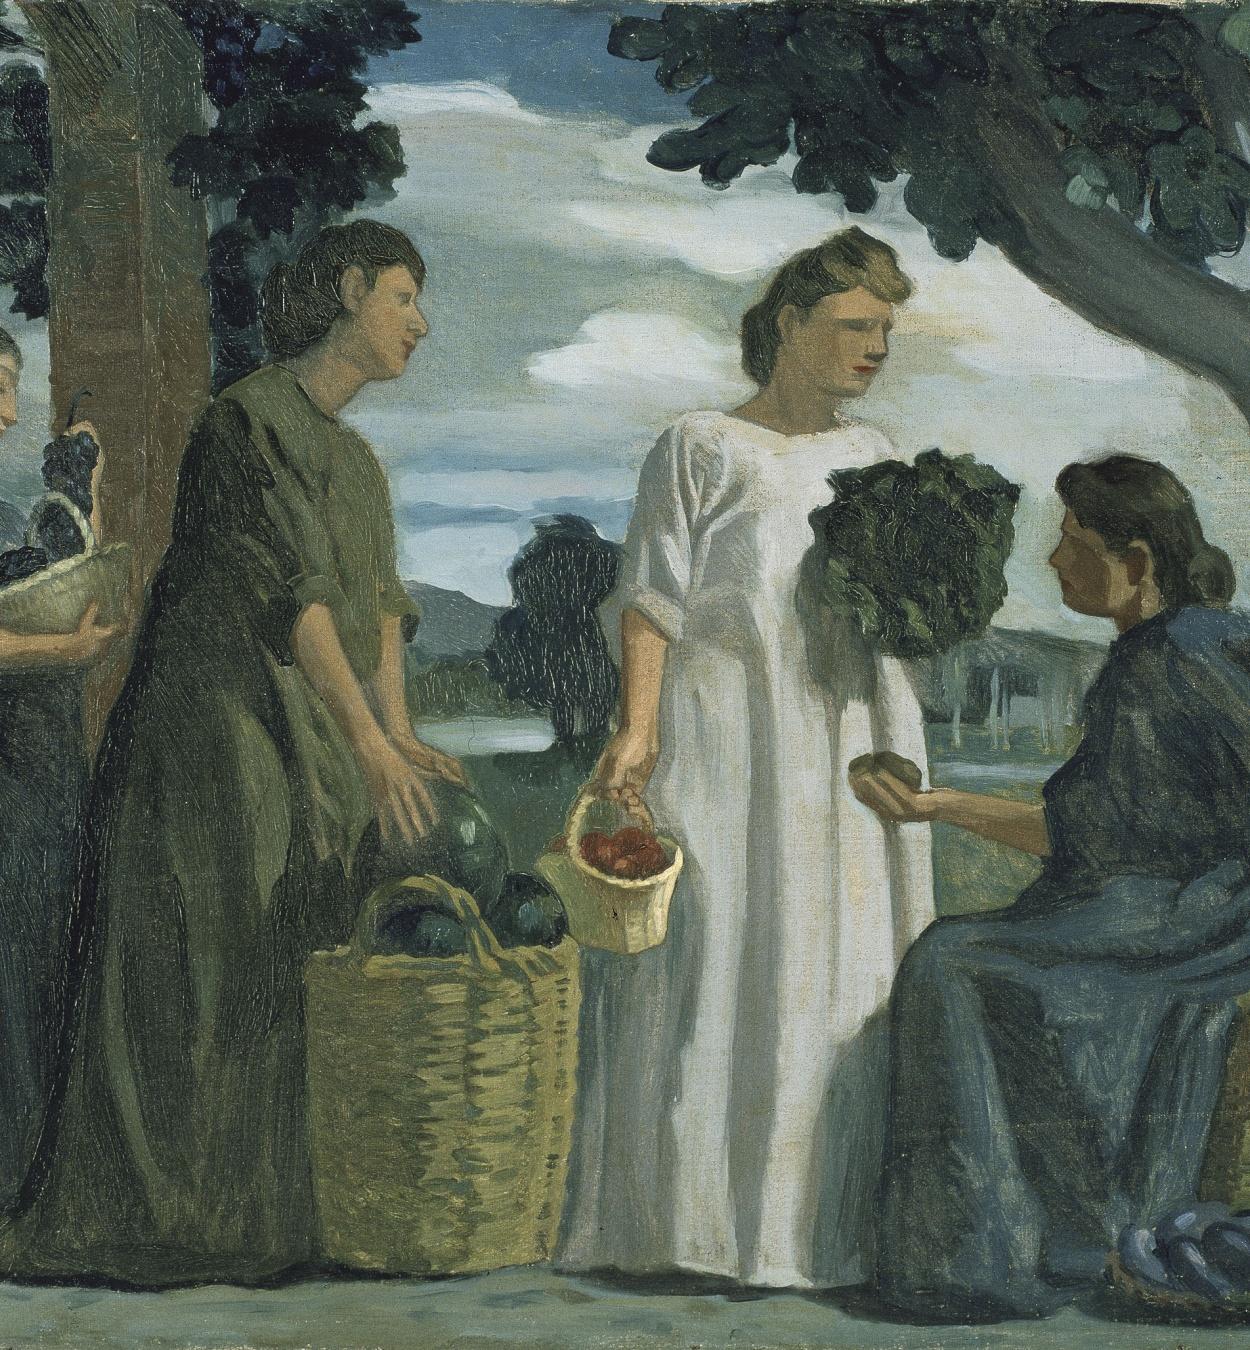 Joaquim Torres-García - Dones de poble - 1911